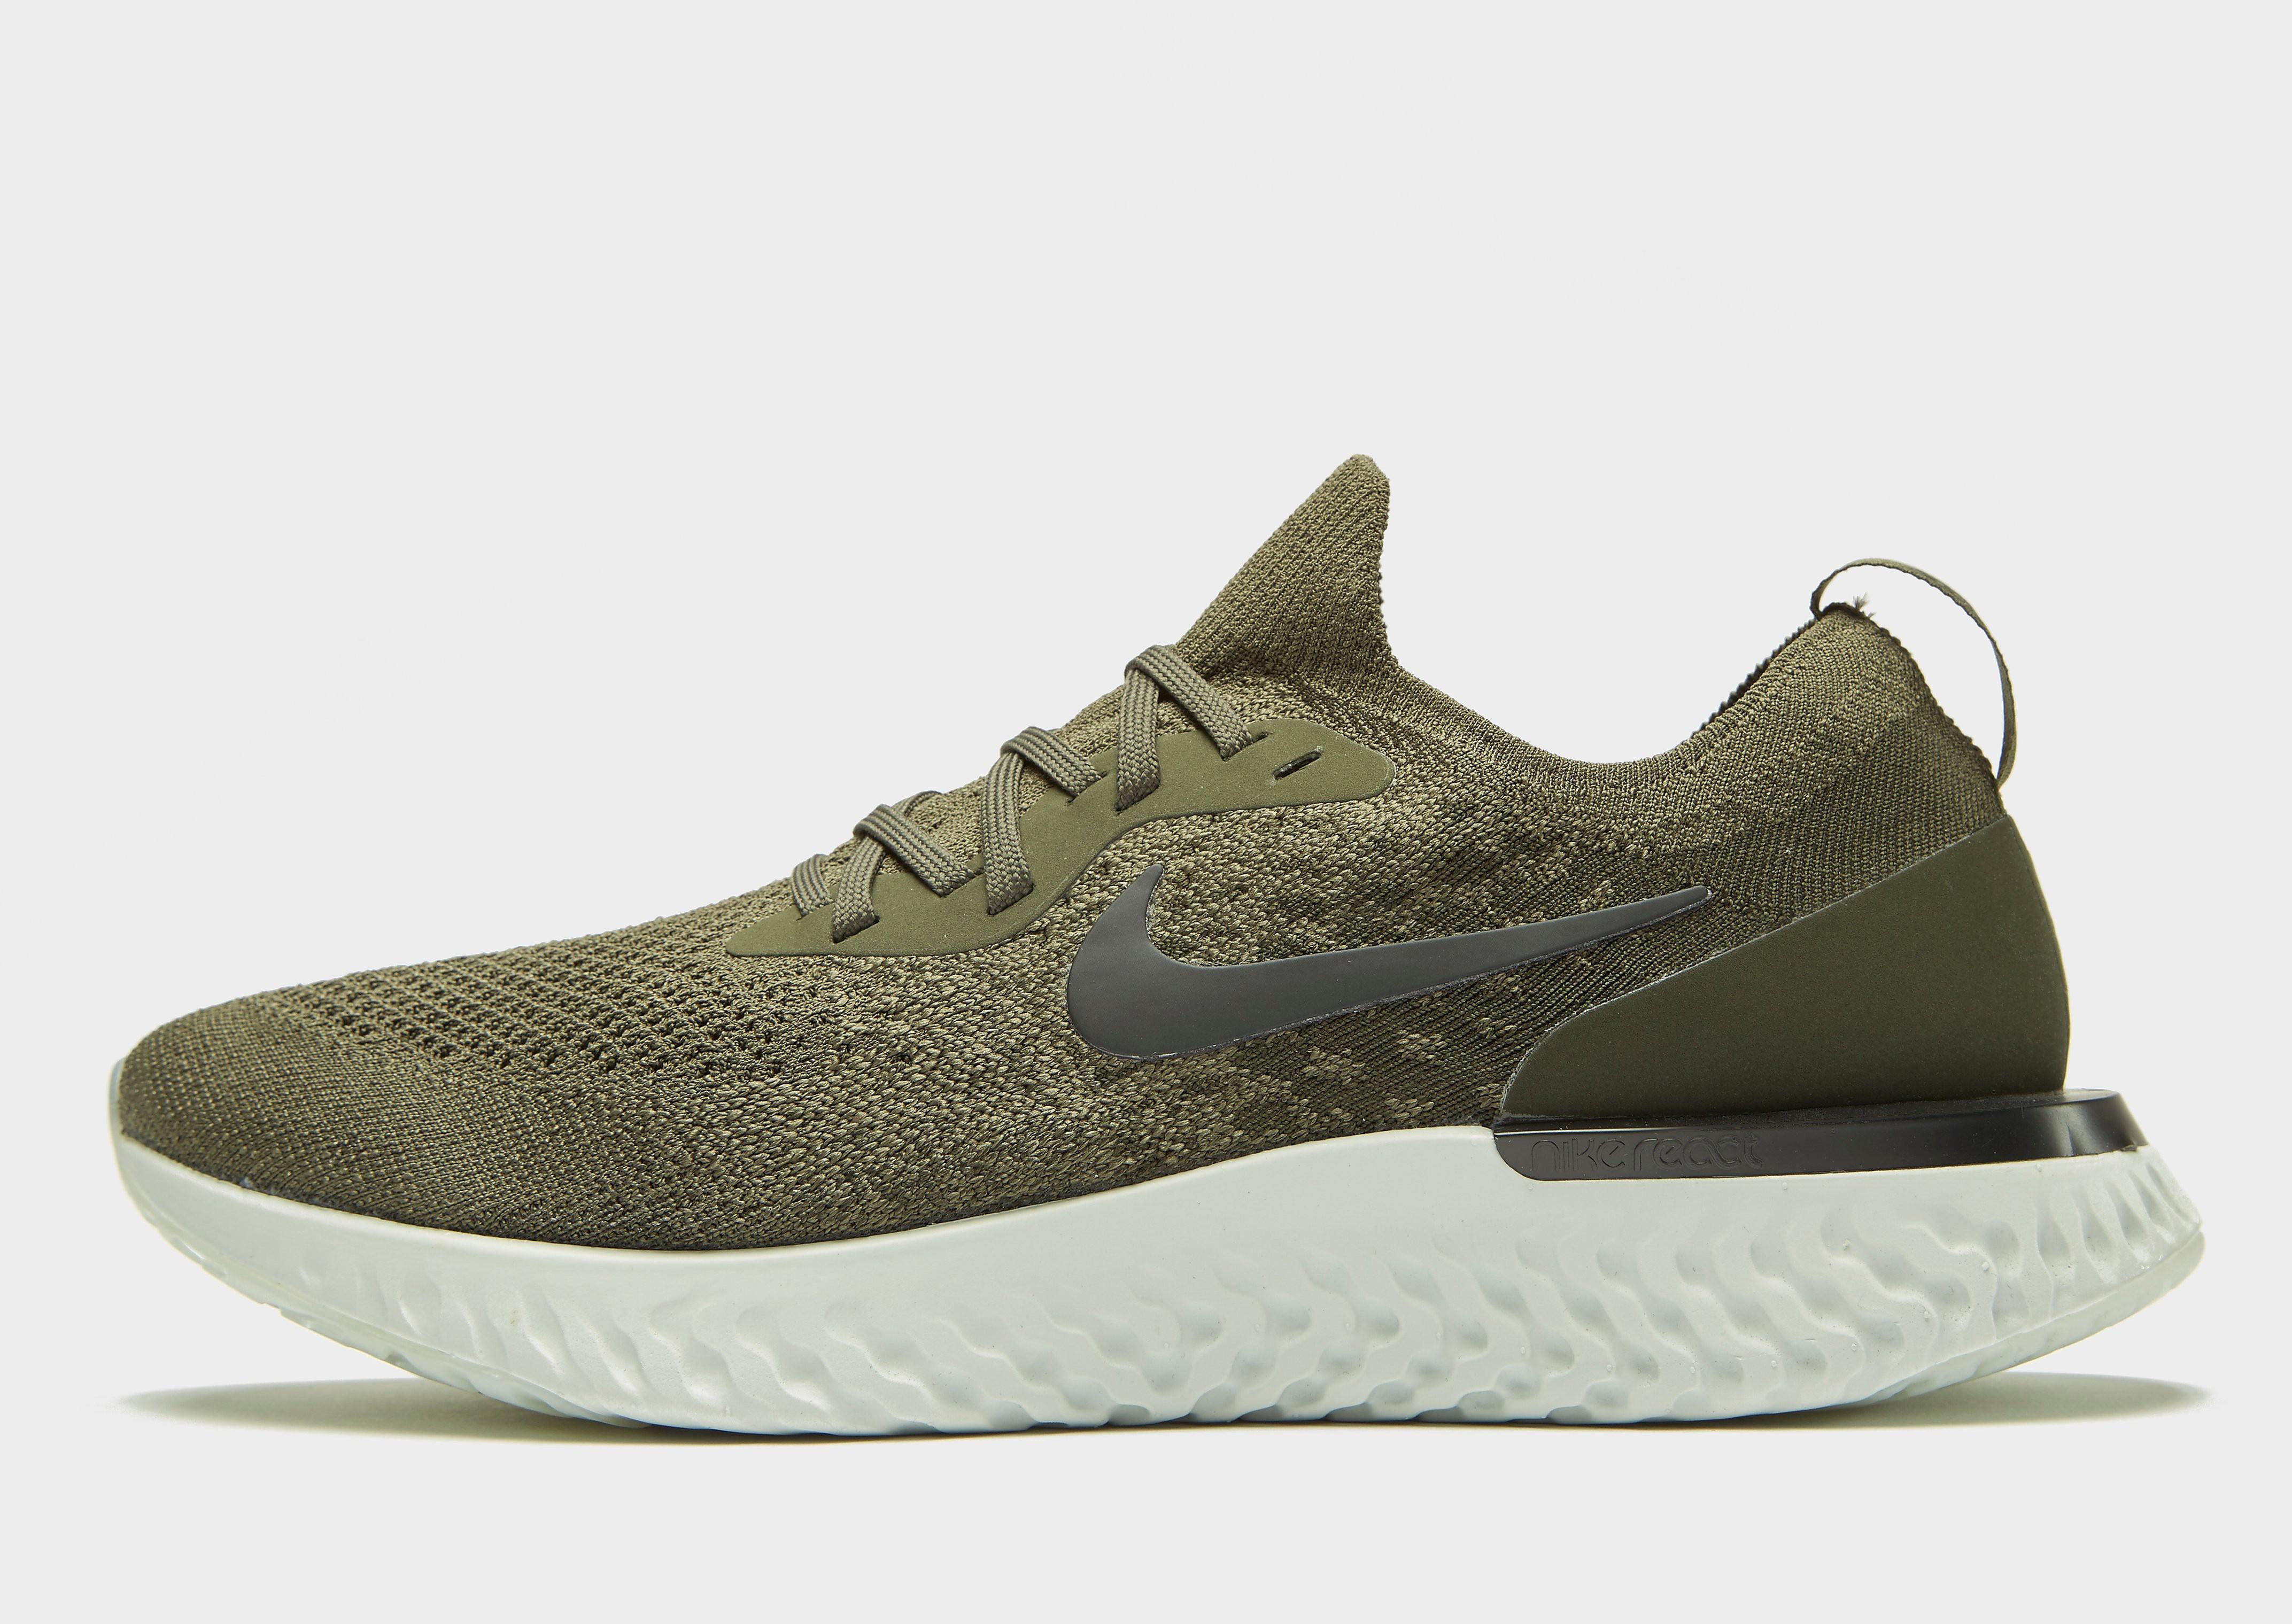 Nike Epic React Flyknit Heren - Khaki - Heren